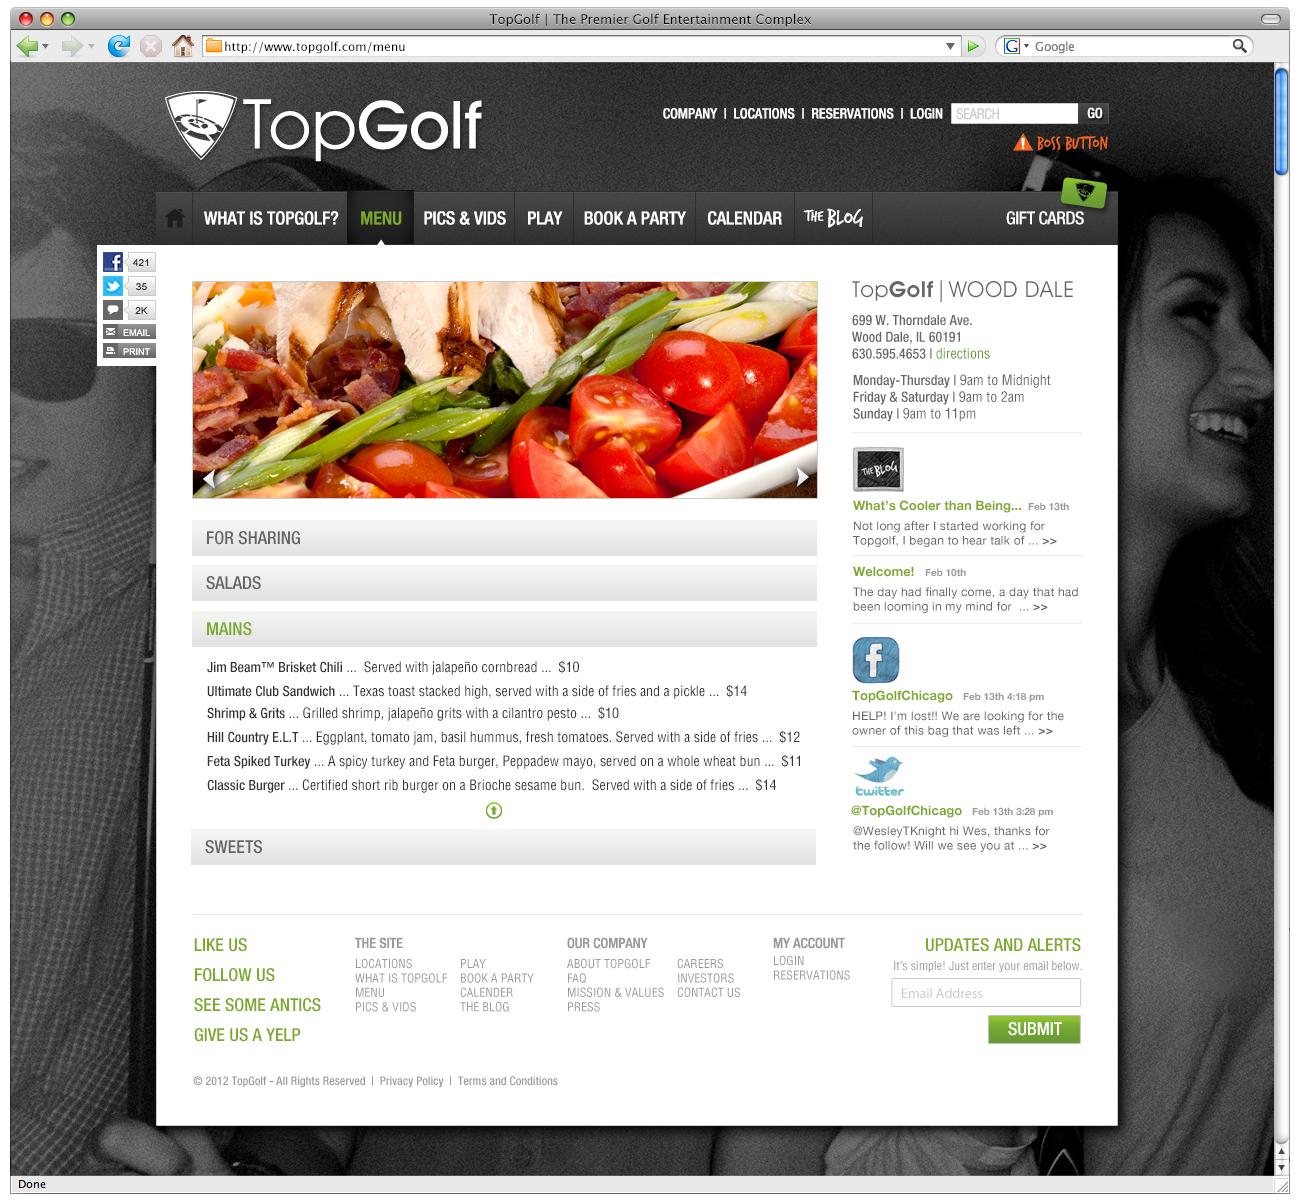 TopGolf Site Redesign 2012